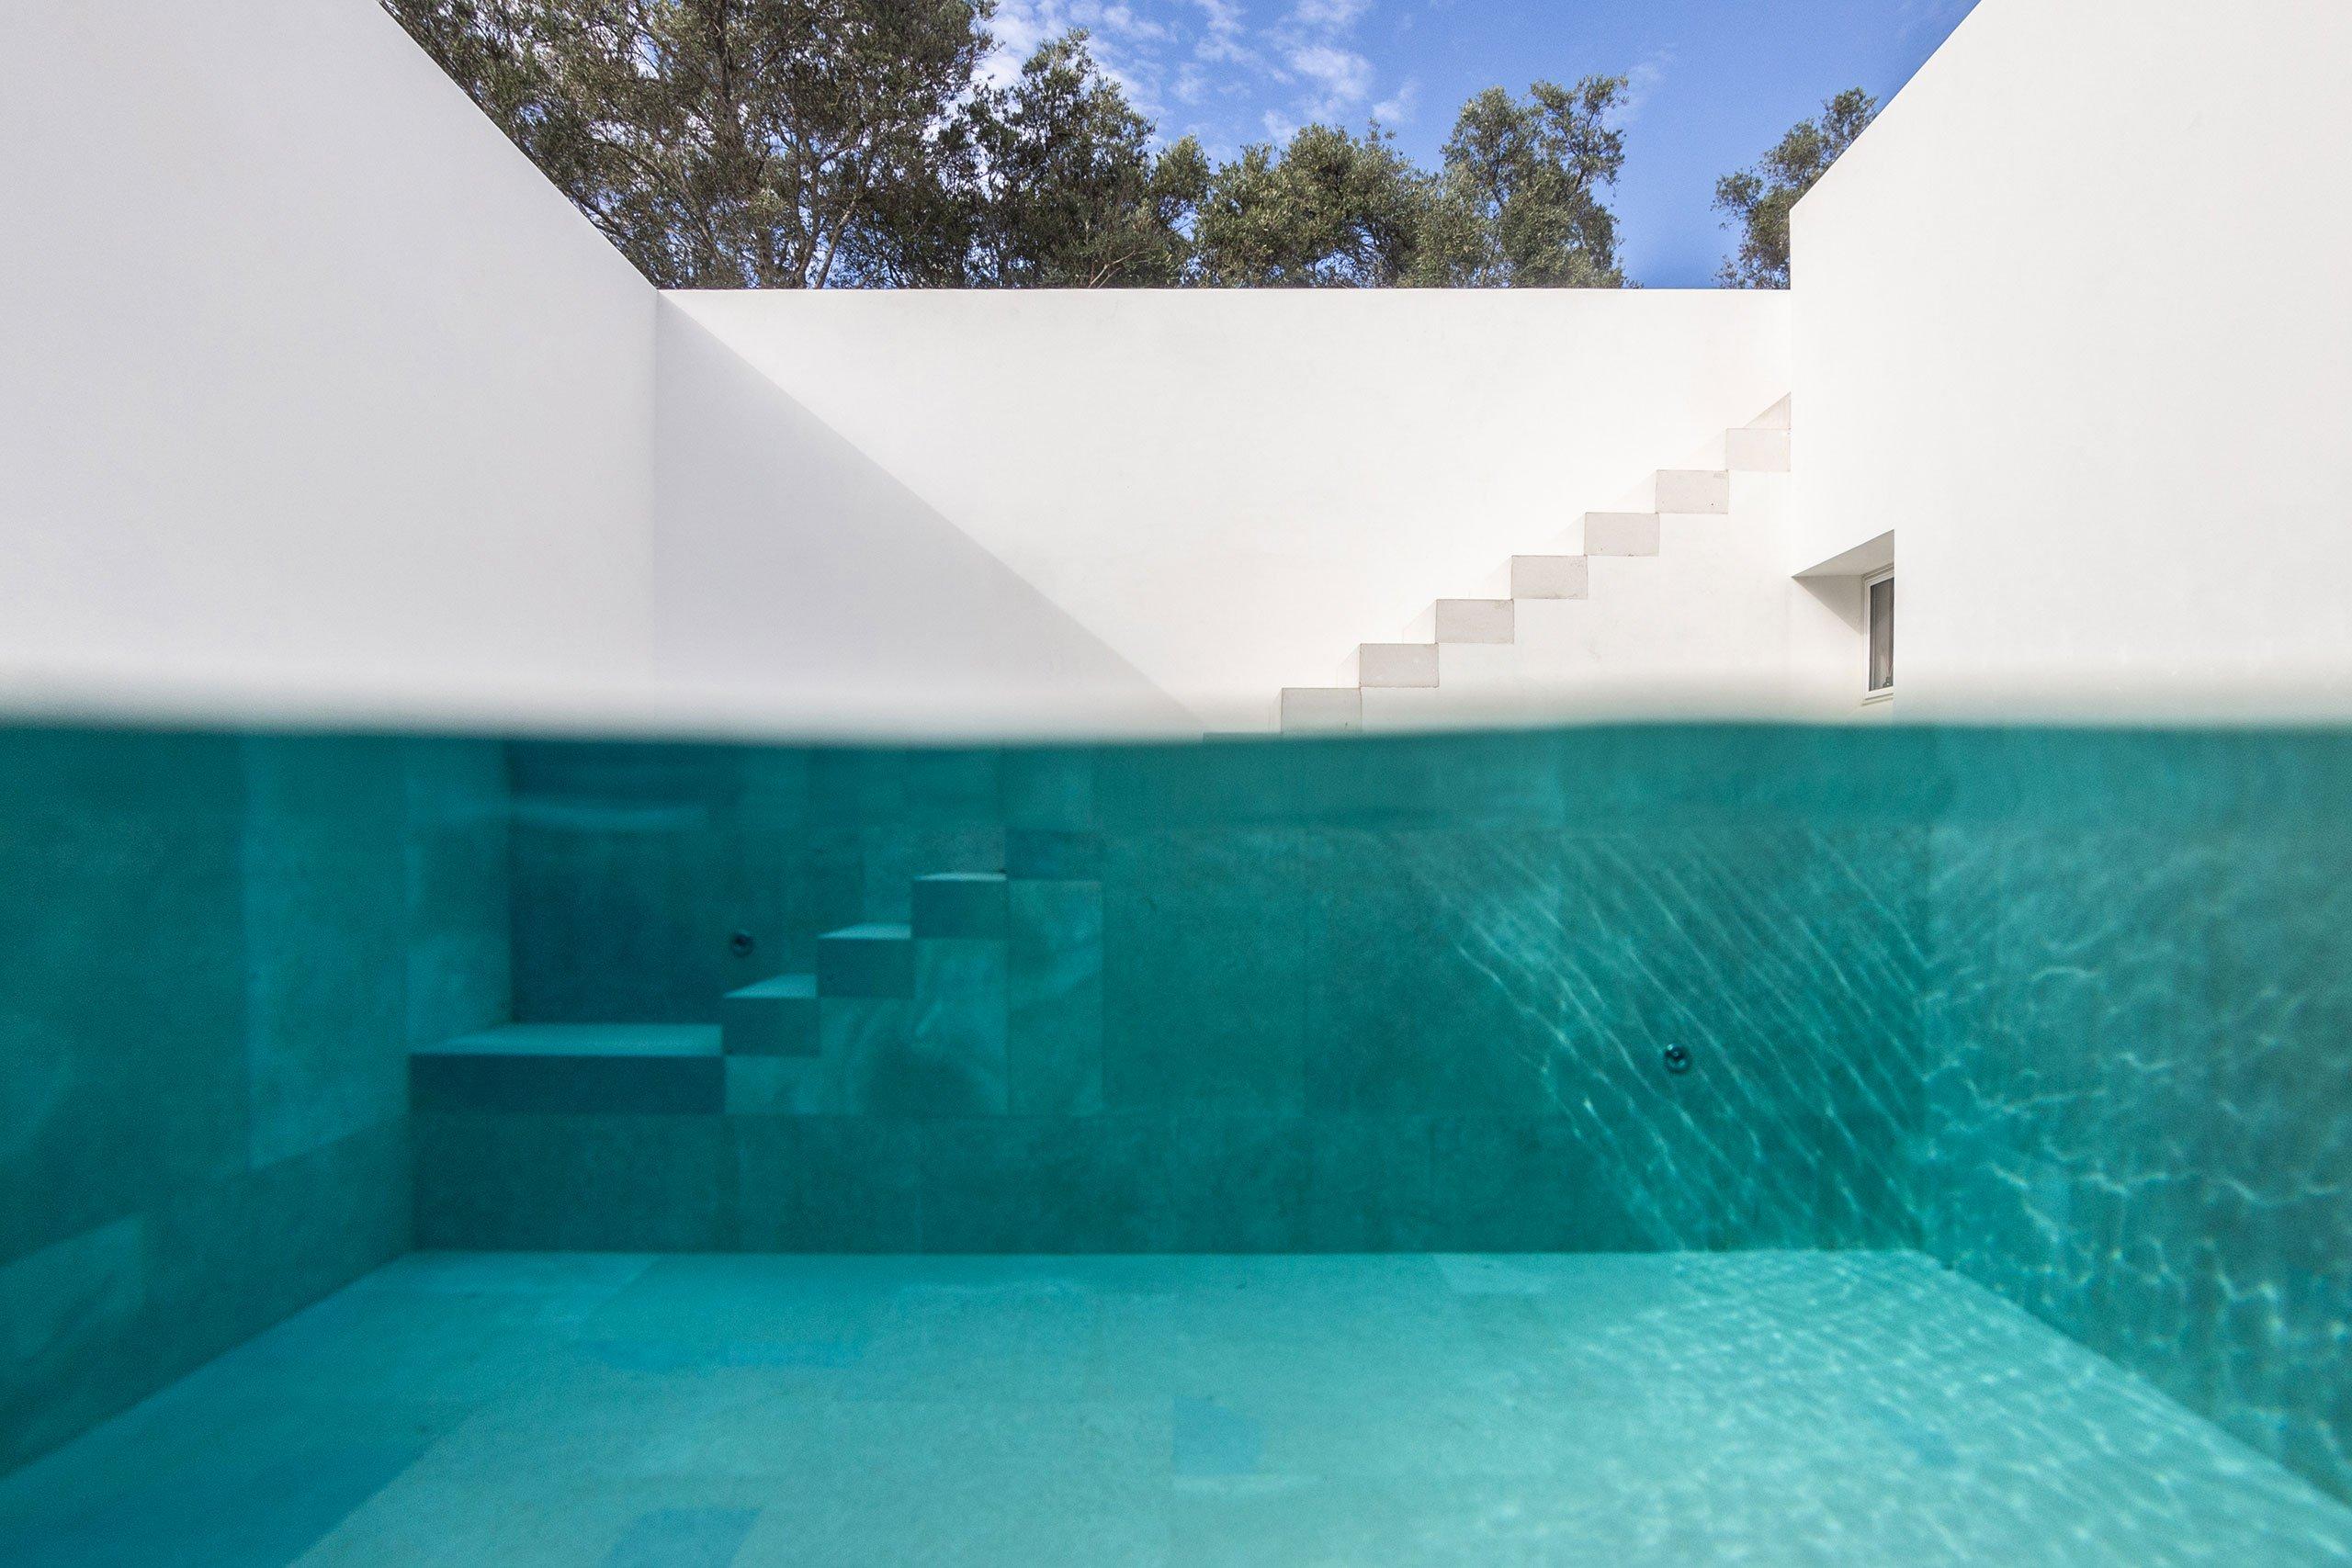 casa-luum-minimalizmus-a-portugal-videken-noko-06.jpg